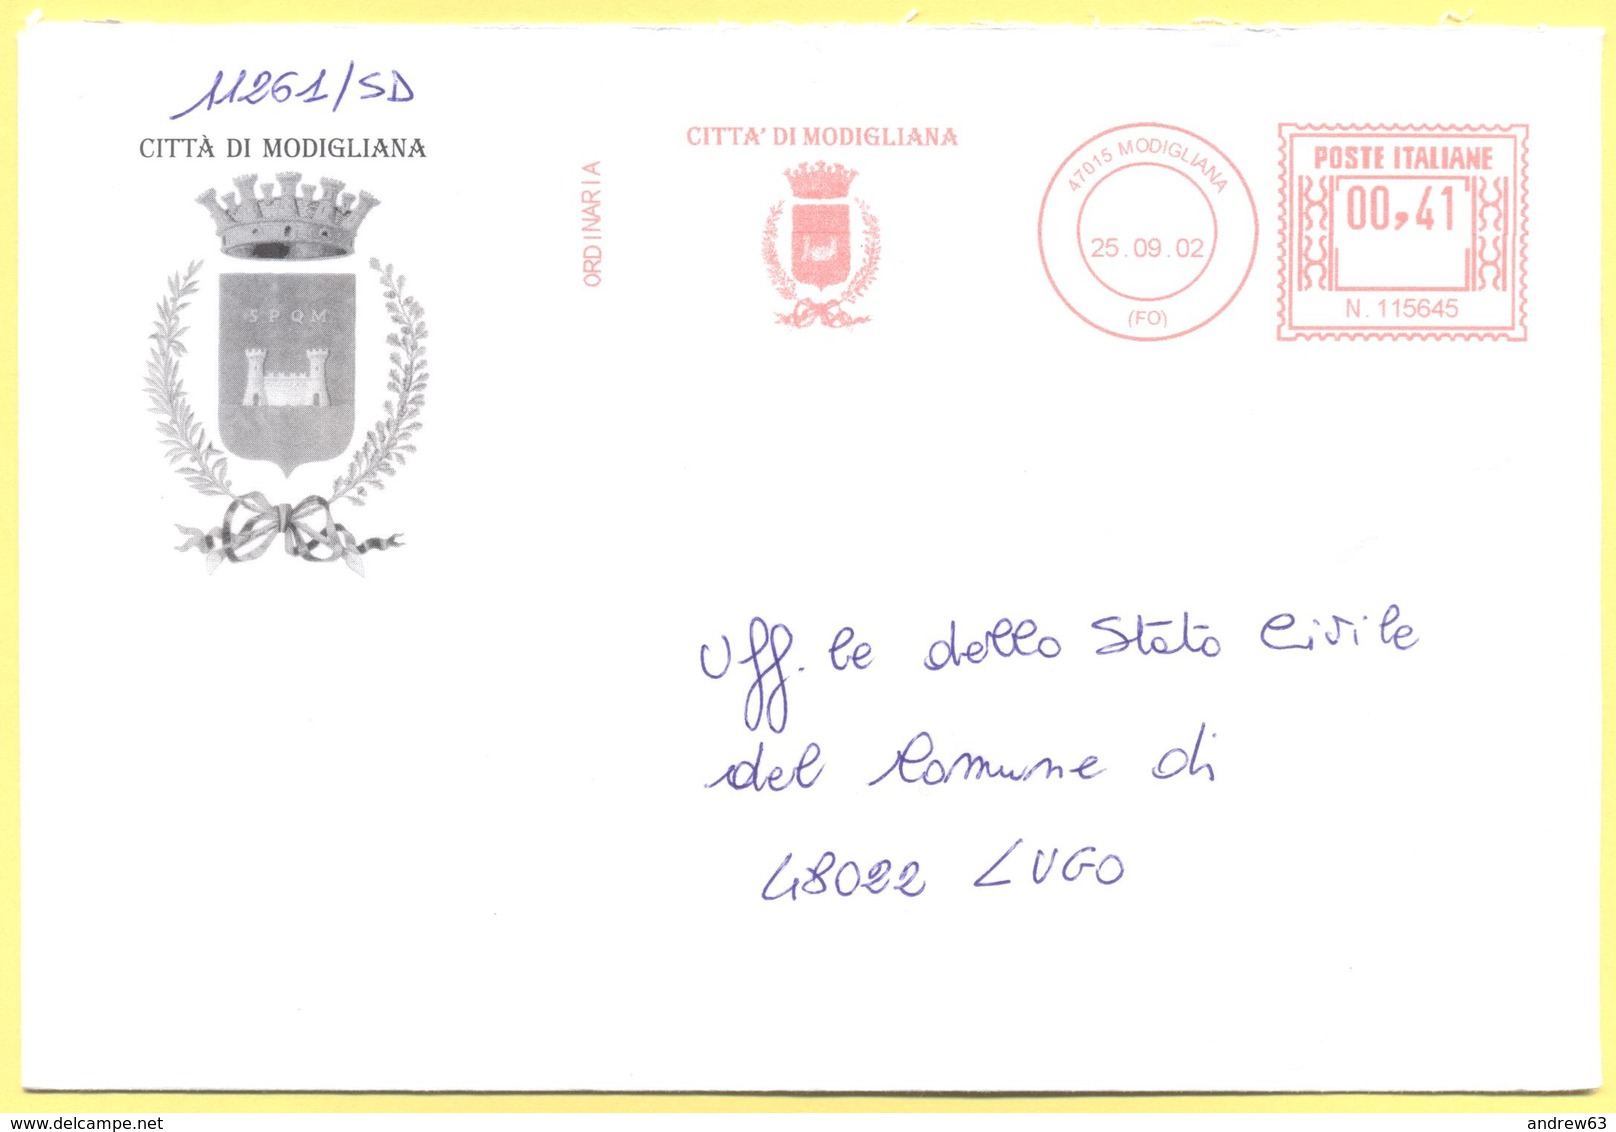 ITALIA - ITALY - ITALIE - 2002 - 00,41 EMA, Red Cancel - Città Di Modigliana - Viaggiata Da Modigliana Per Lugo - Affrancature Meccaniche Rosse (EMA)